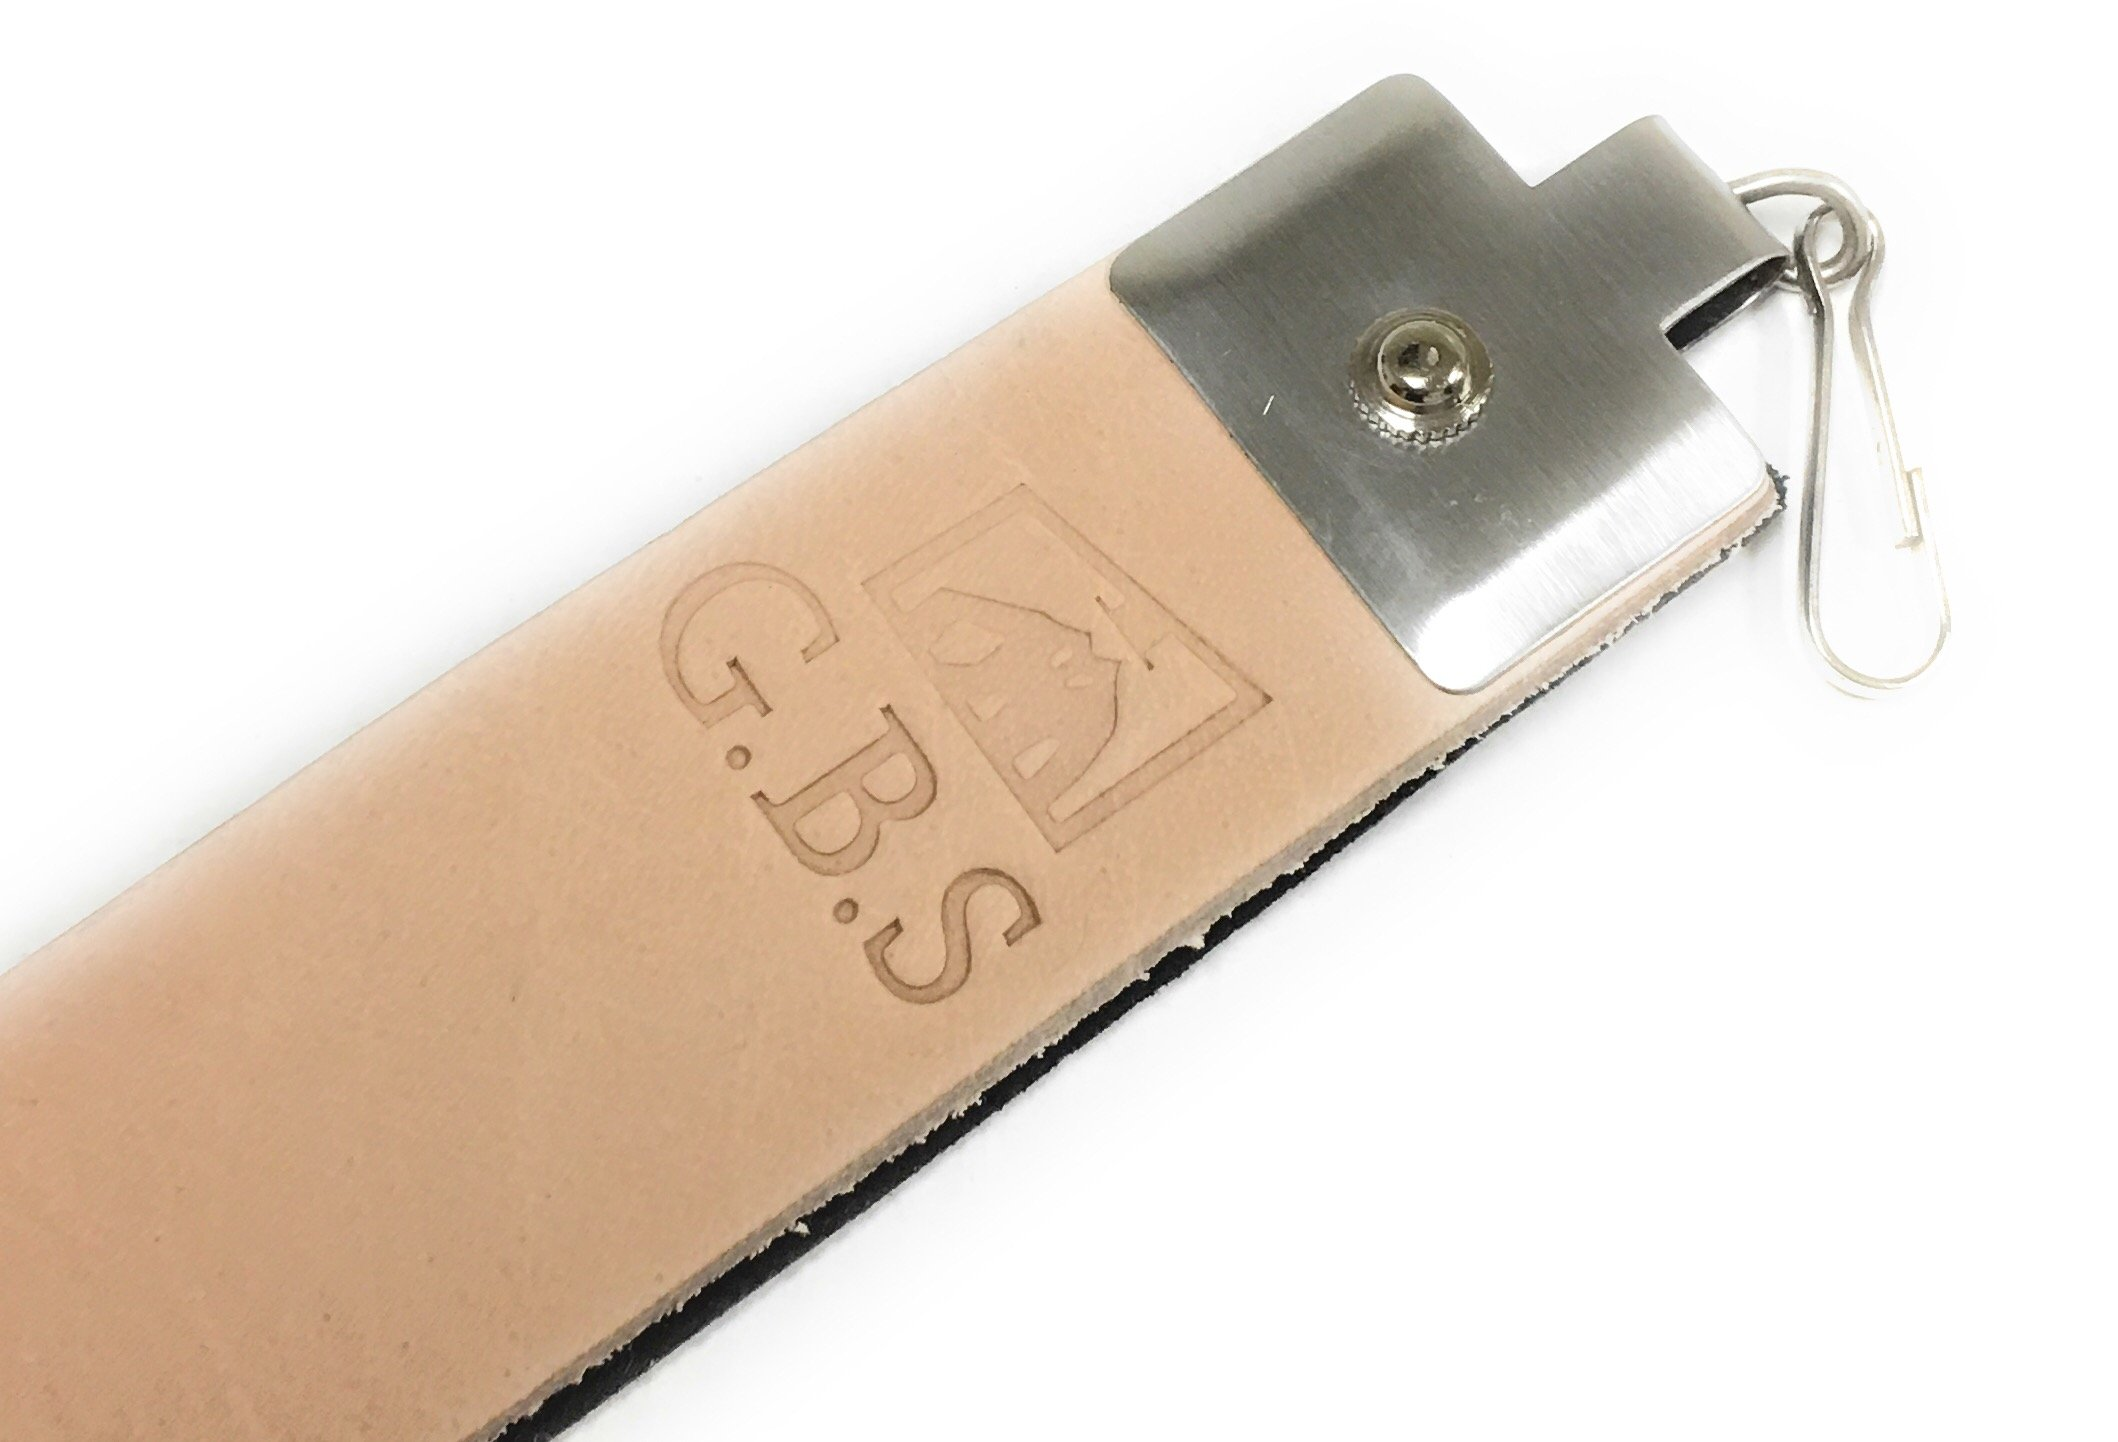 Hanging Leather Razor Strop Knives Scissors Tools 10 Oz Top Grain Cowhide (1)